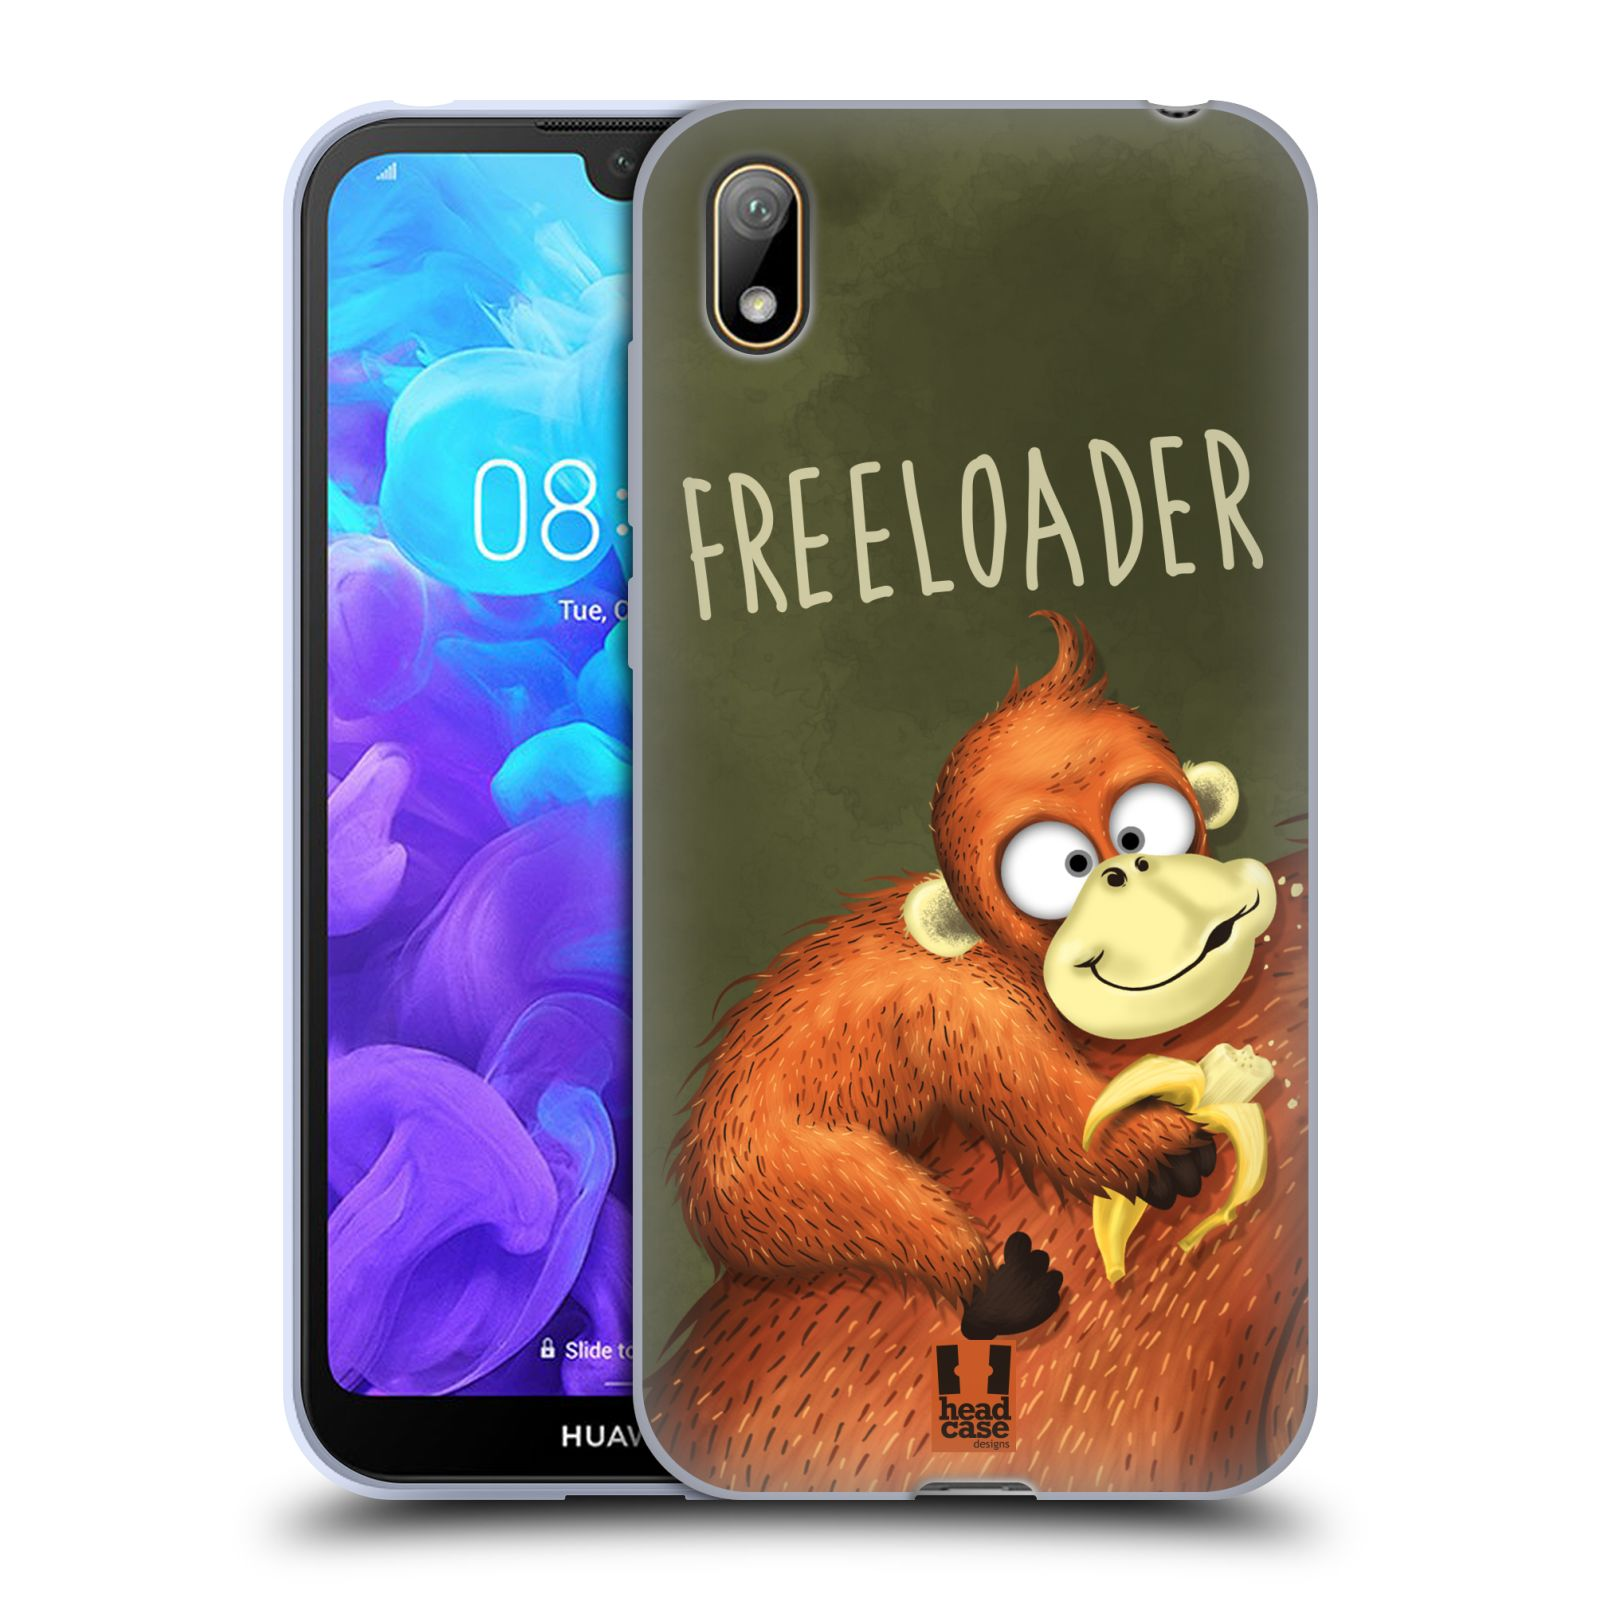 Silikonové pouzdro na mobil Huawei Y5 (2019) - Head Case - Opičák Freeloader